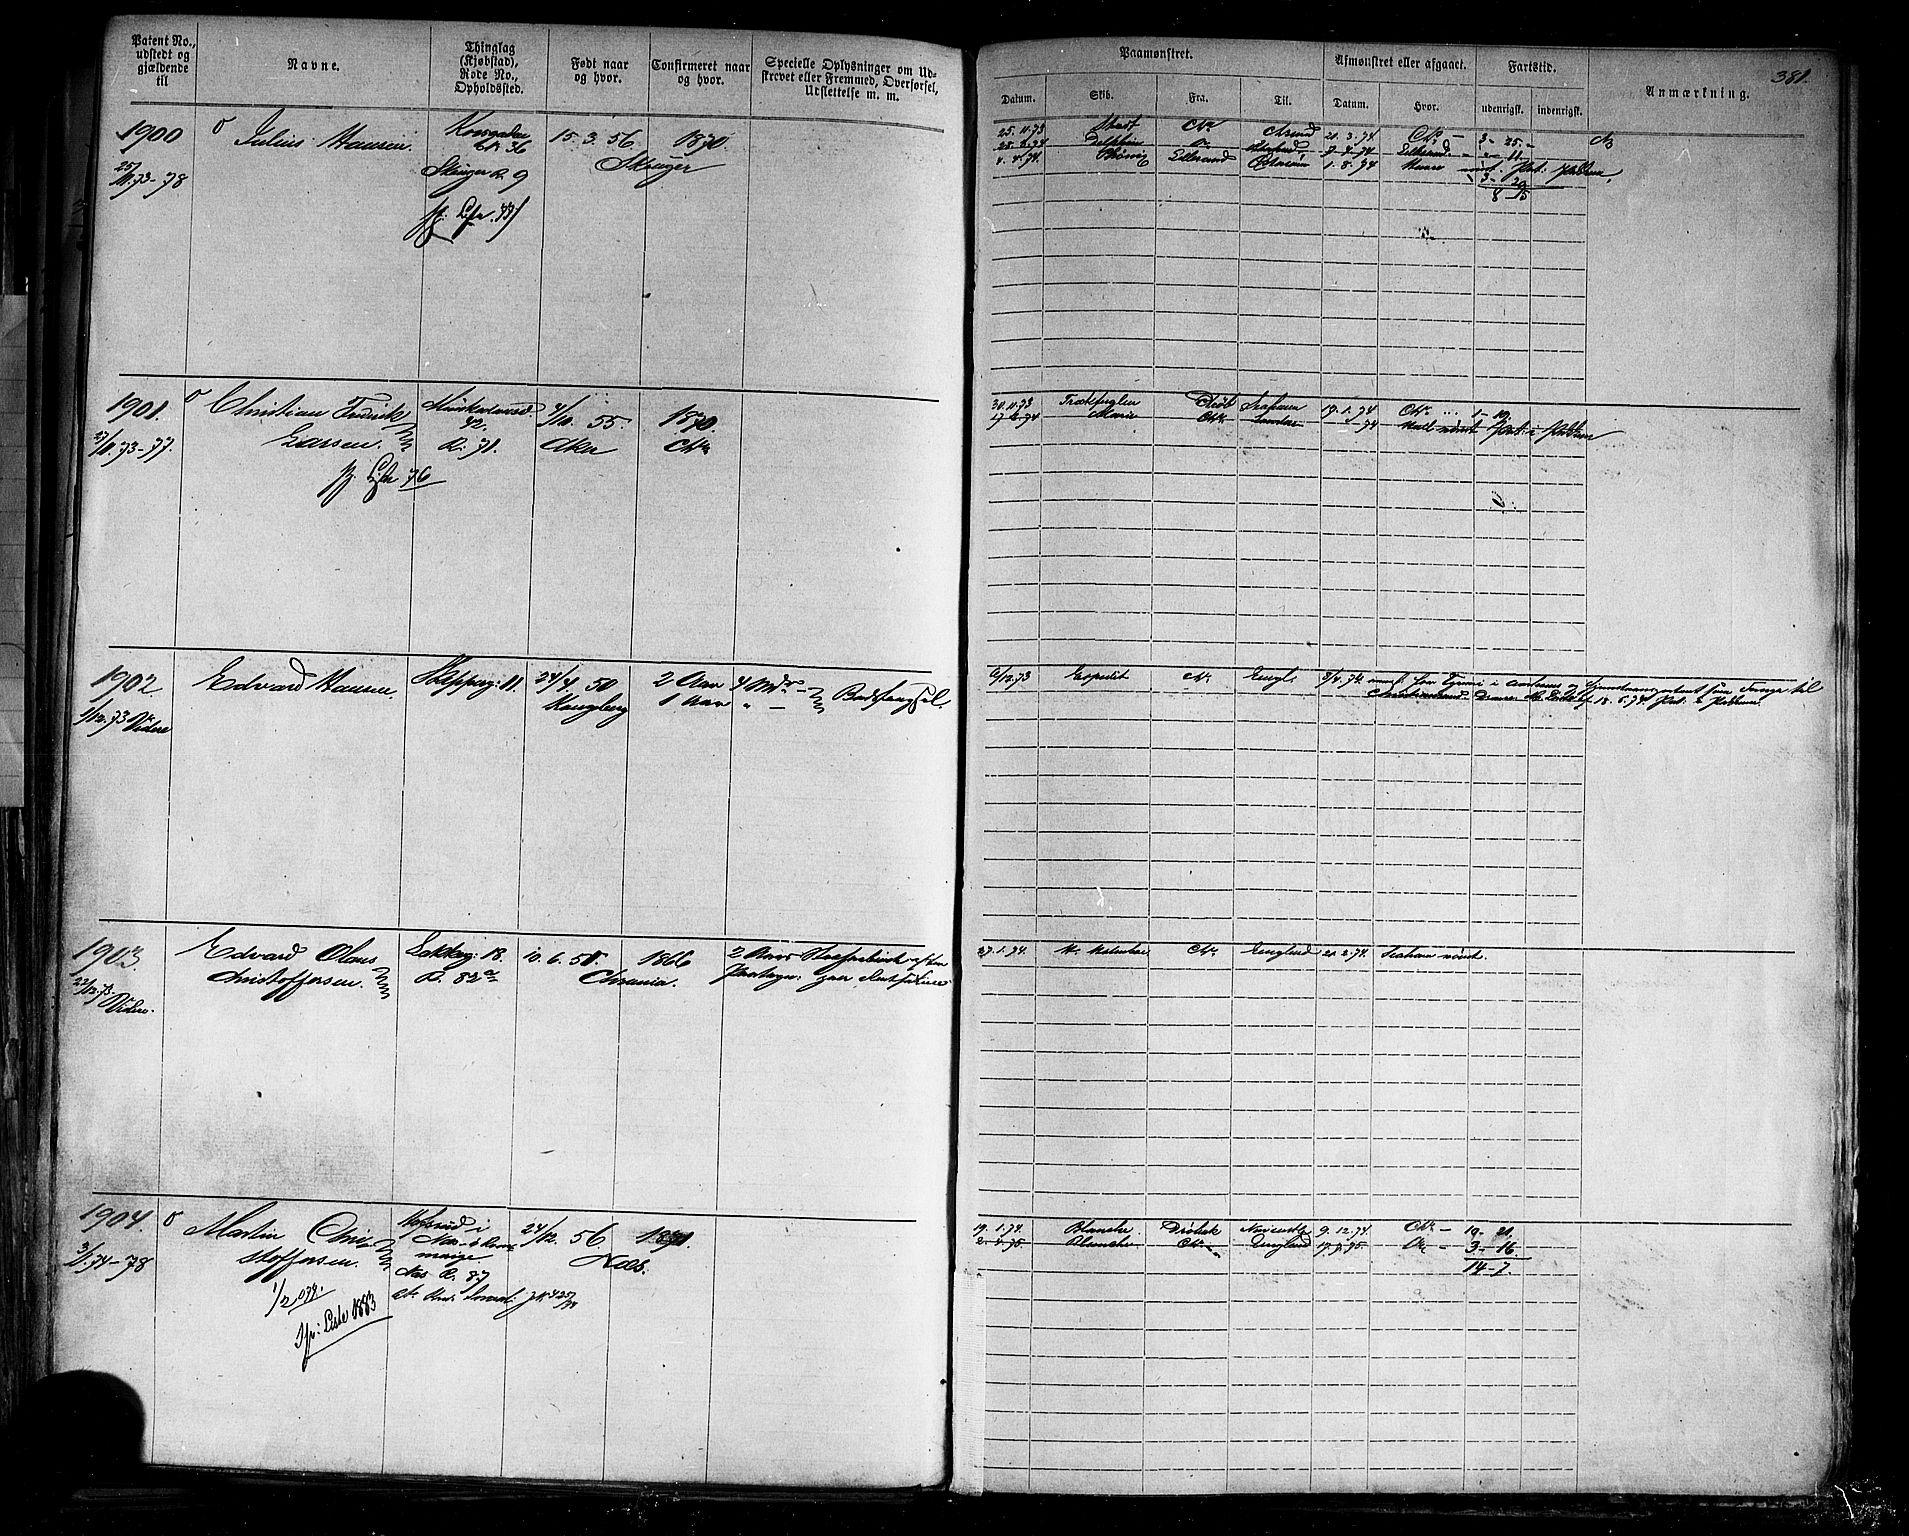 SAO, Oslo mønstringskontor, F/Fc/Fca/L0001: Annotasjonsrulle, 1866-1881, s. 380b-381a